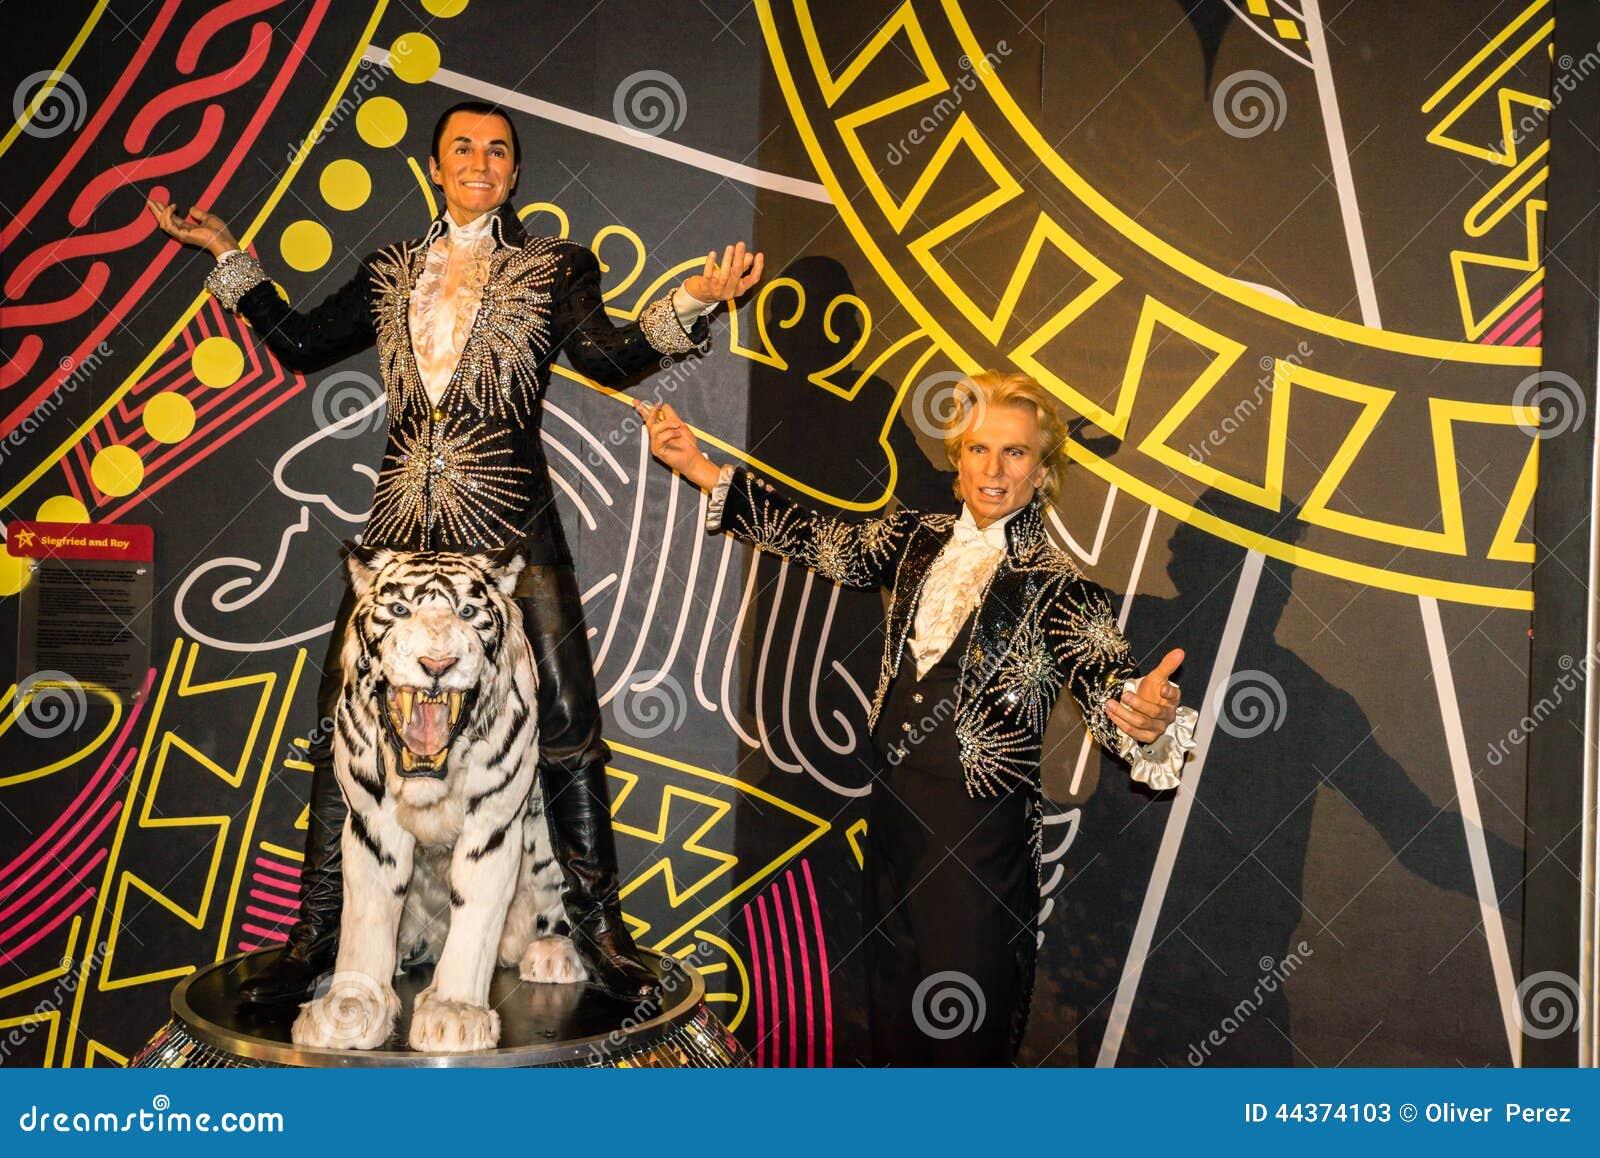 Siegfried e Roy